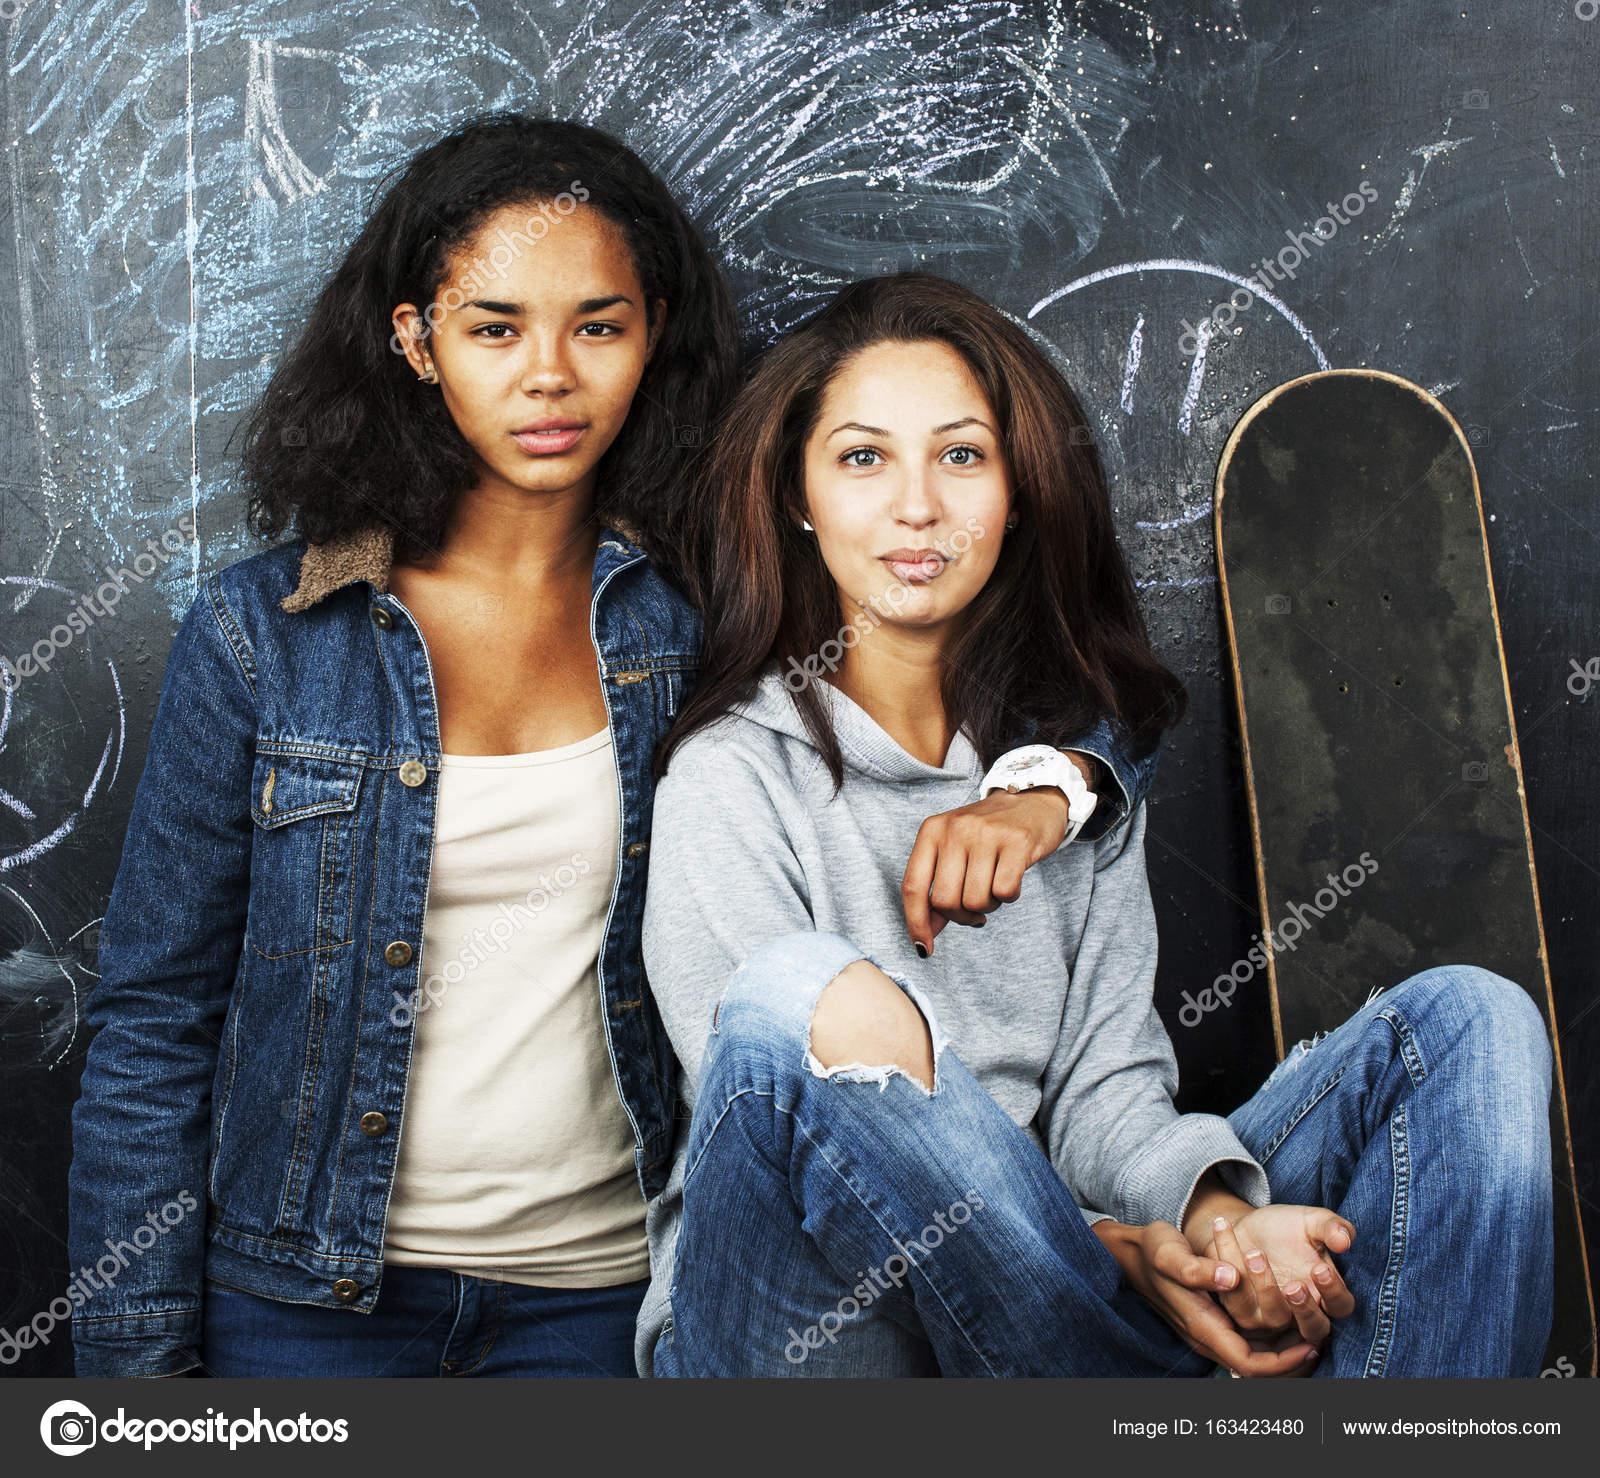 Teen φωτογραφίες κορίτσια νεαρό μαύρο λεσβιακό σεξ